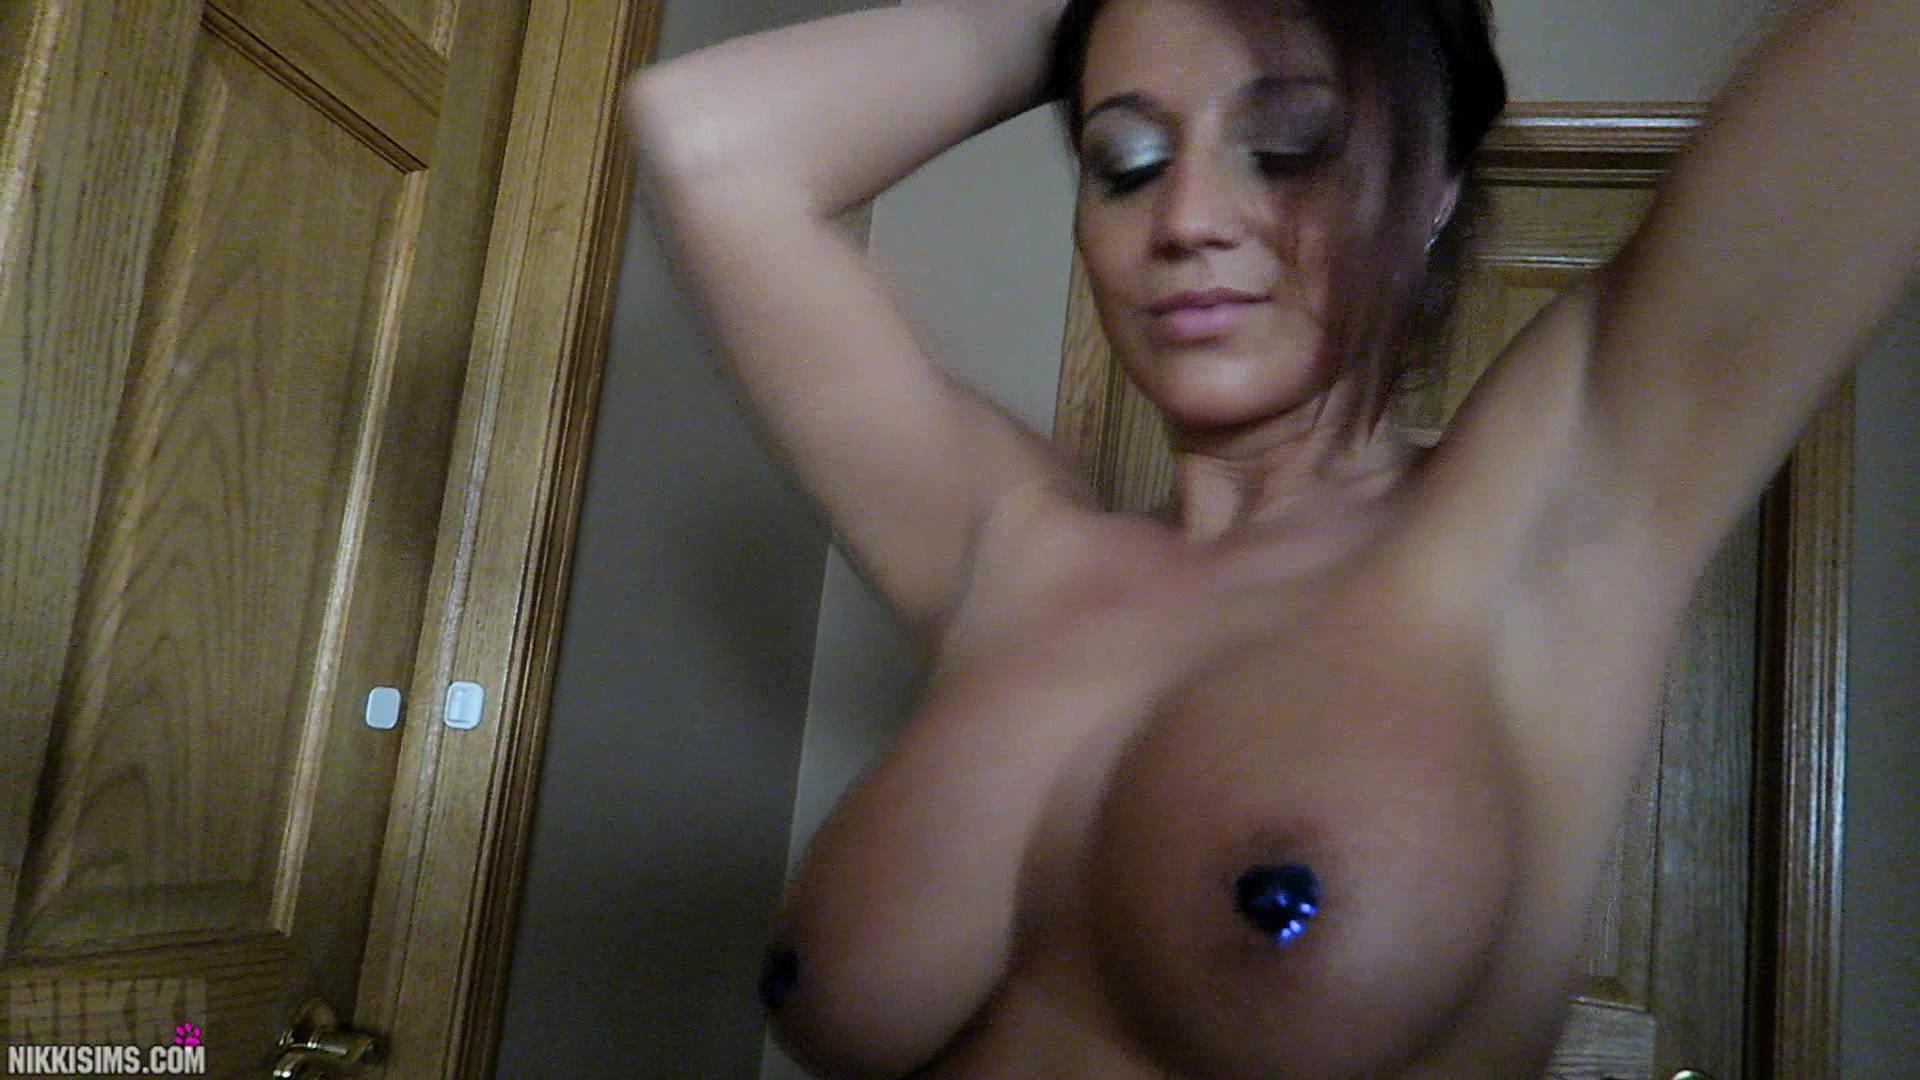 Nikki sims nude shower